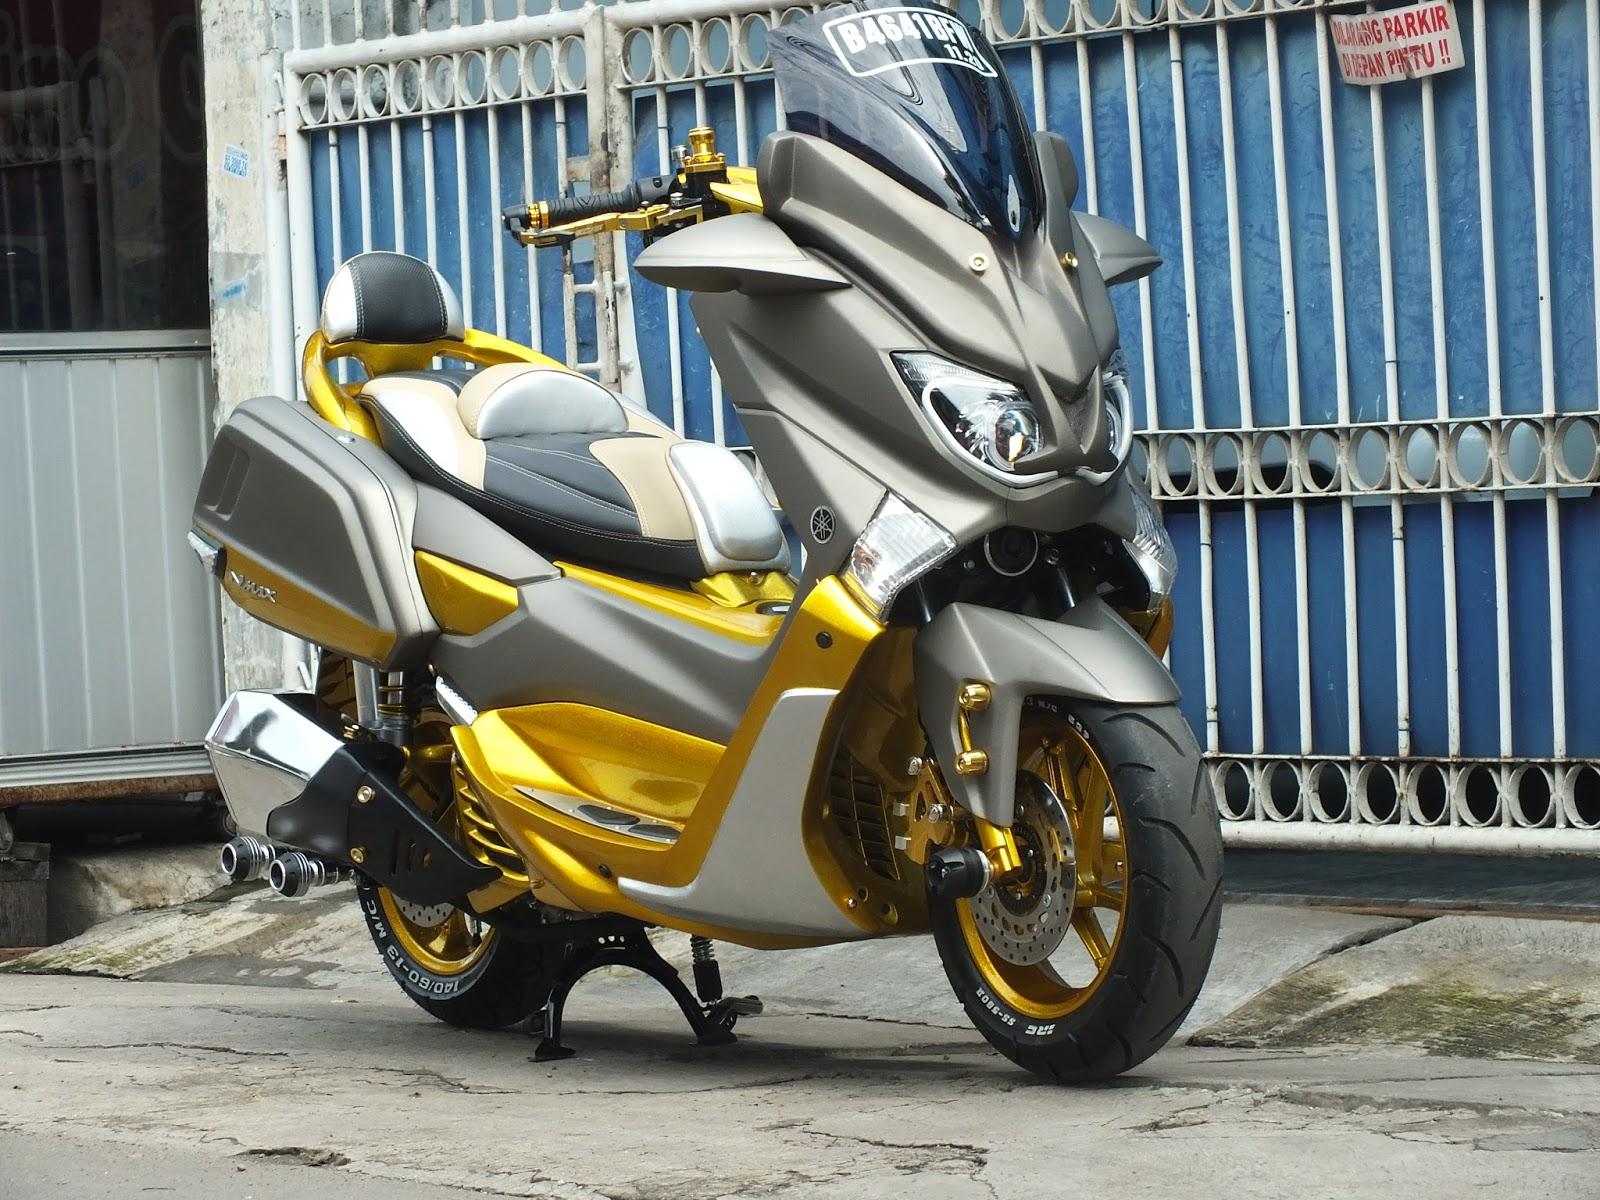 Modifikasi Jok Motor  Jok Motor Nmax Model Nmax Retro Pesanan Mr  Echwan Jakarta Barat